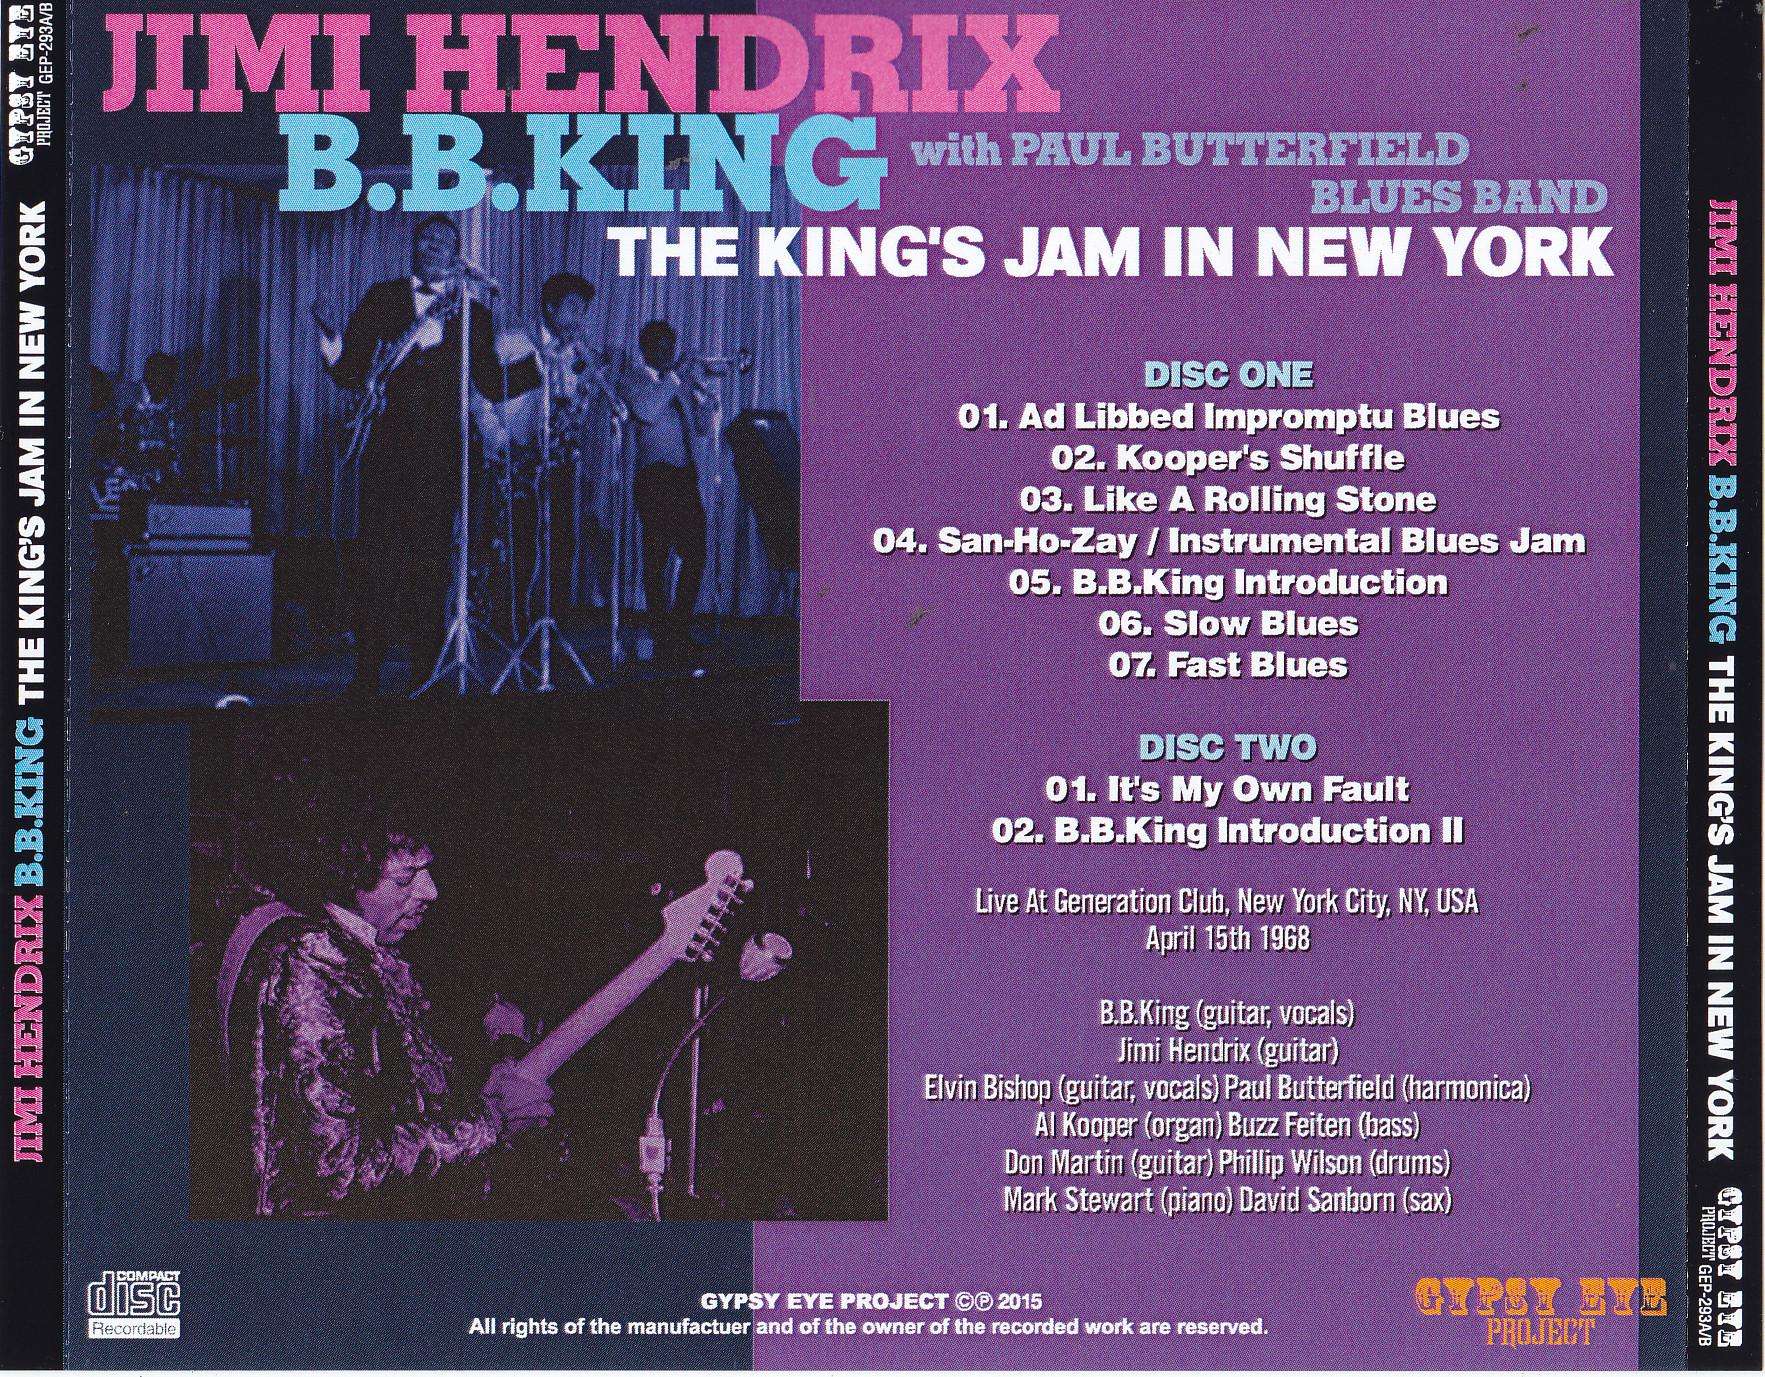 Jimi Hendrix & BB King / The Kings Jam In New York / 2CDR – GiGinJapan